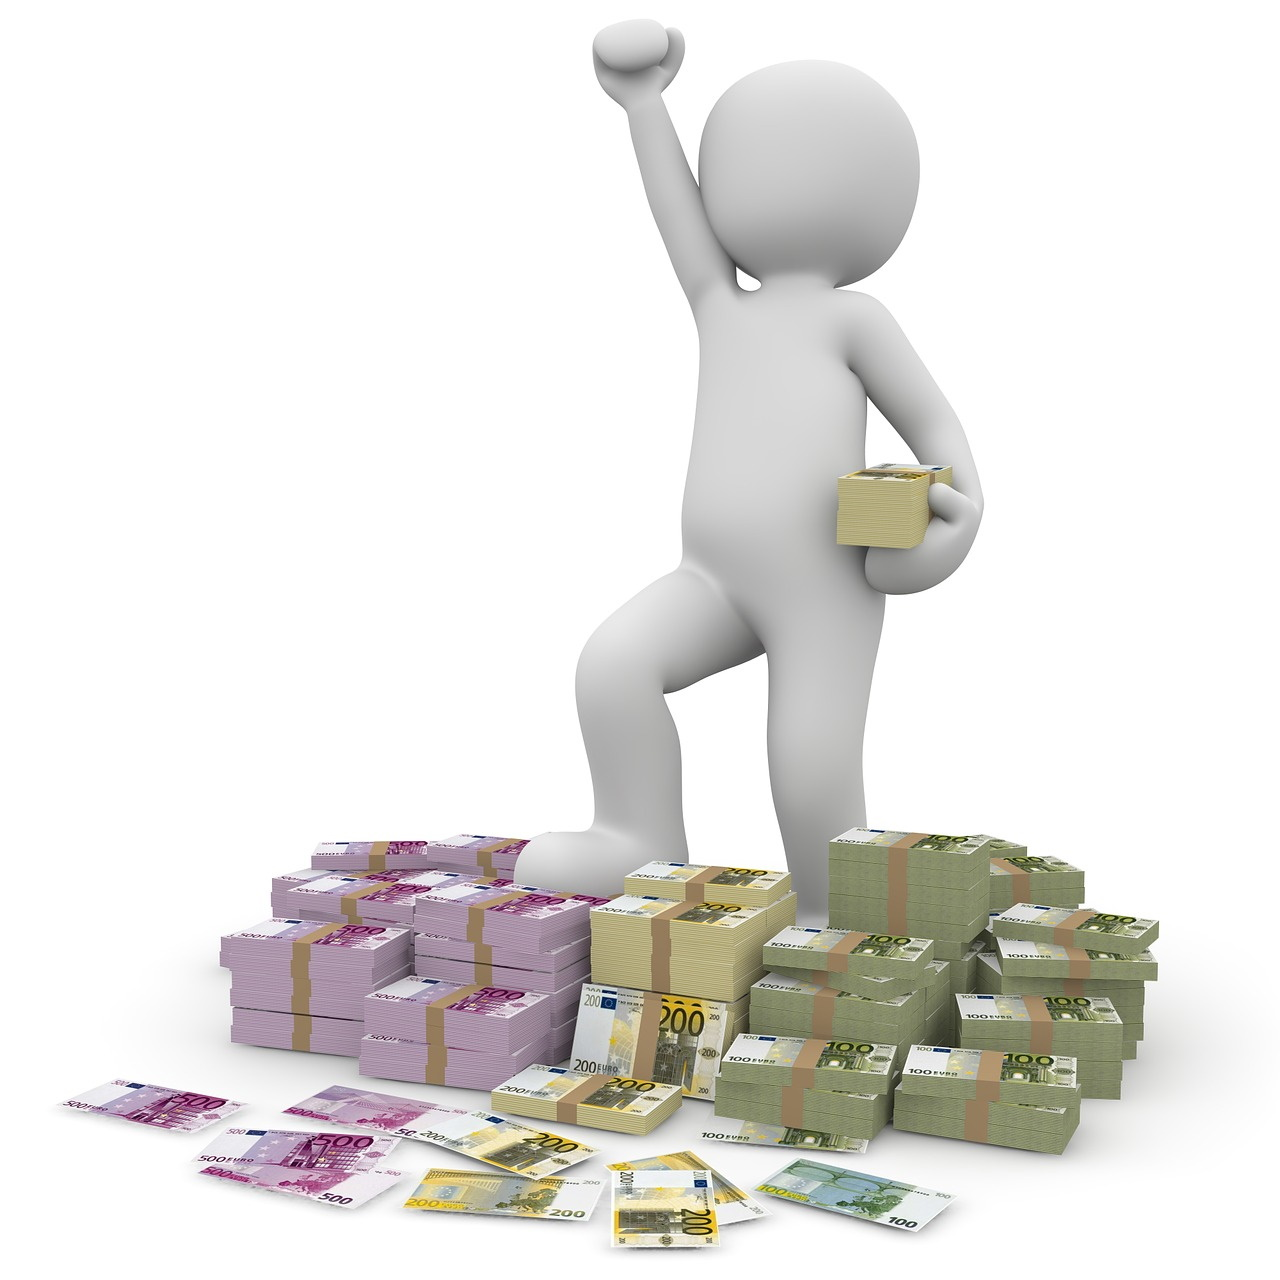 ShadowTrader FX Hour 08.10.21 – Dollar Dominance Despite Inflation